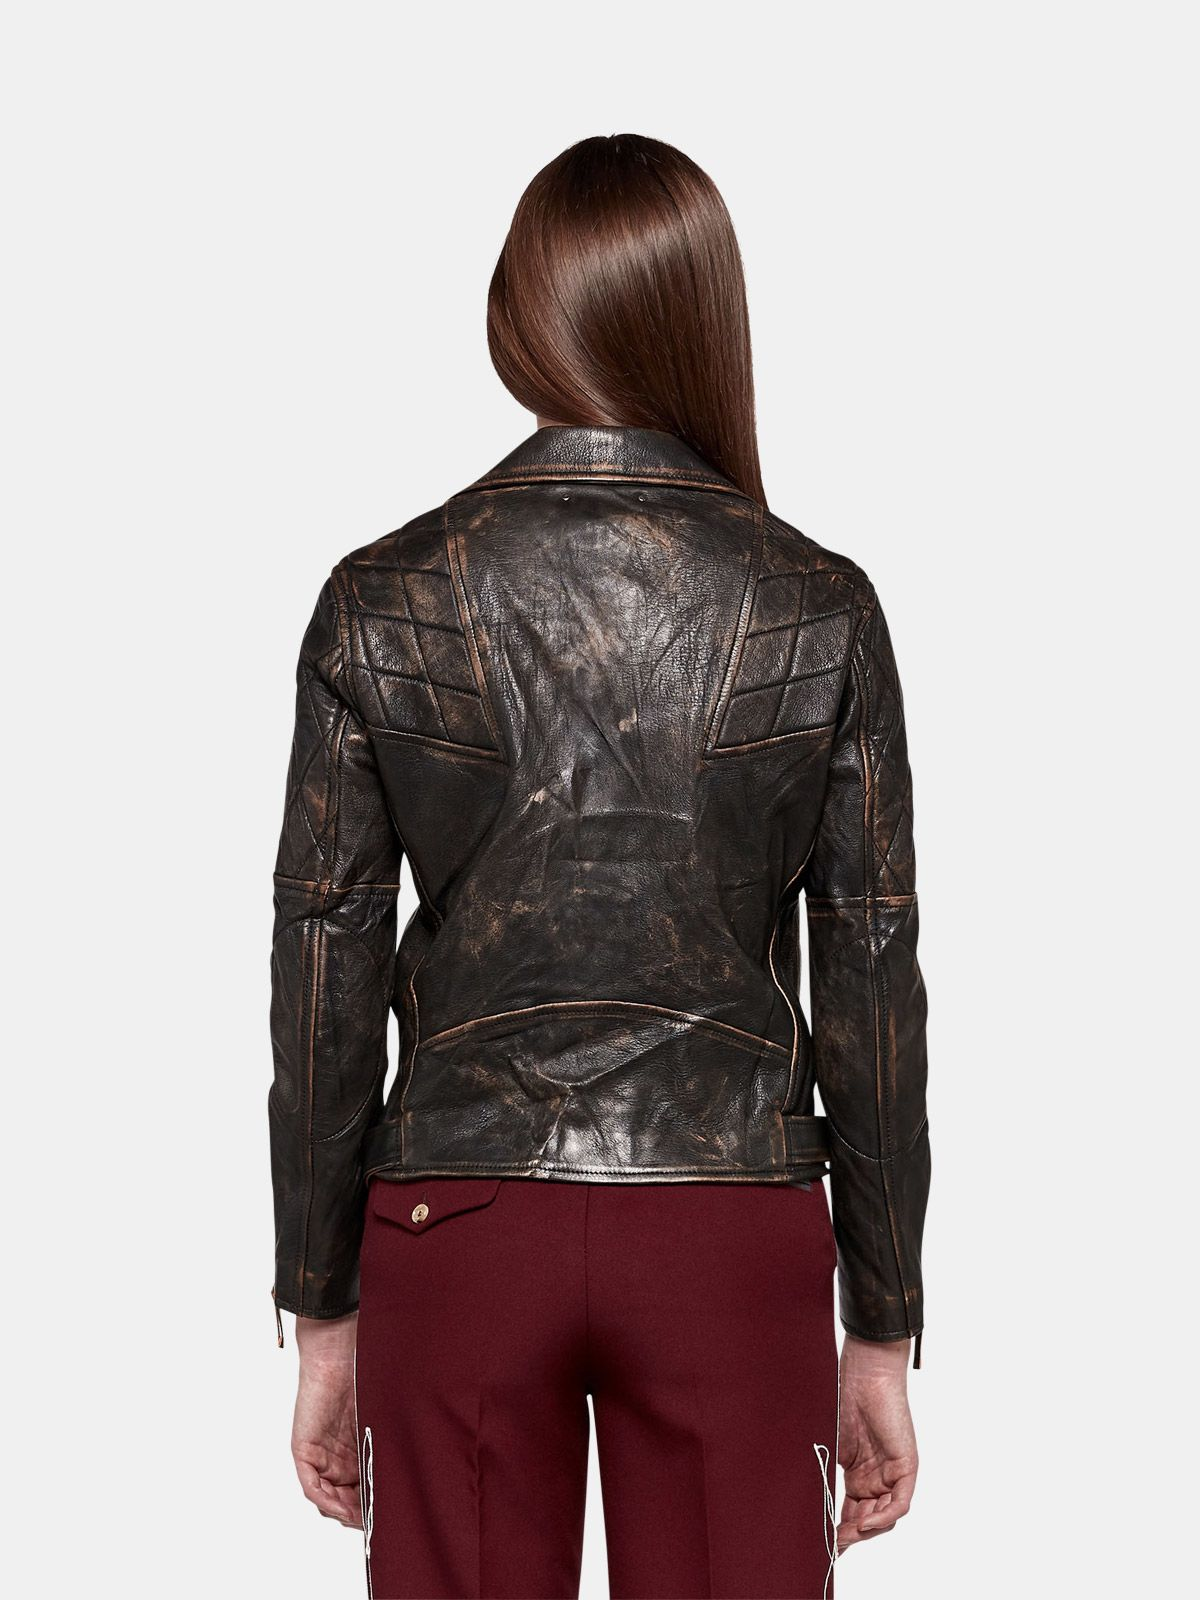 Golden Goose - Yasu biker jacket in brown leather in